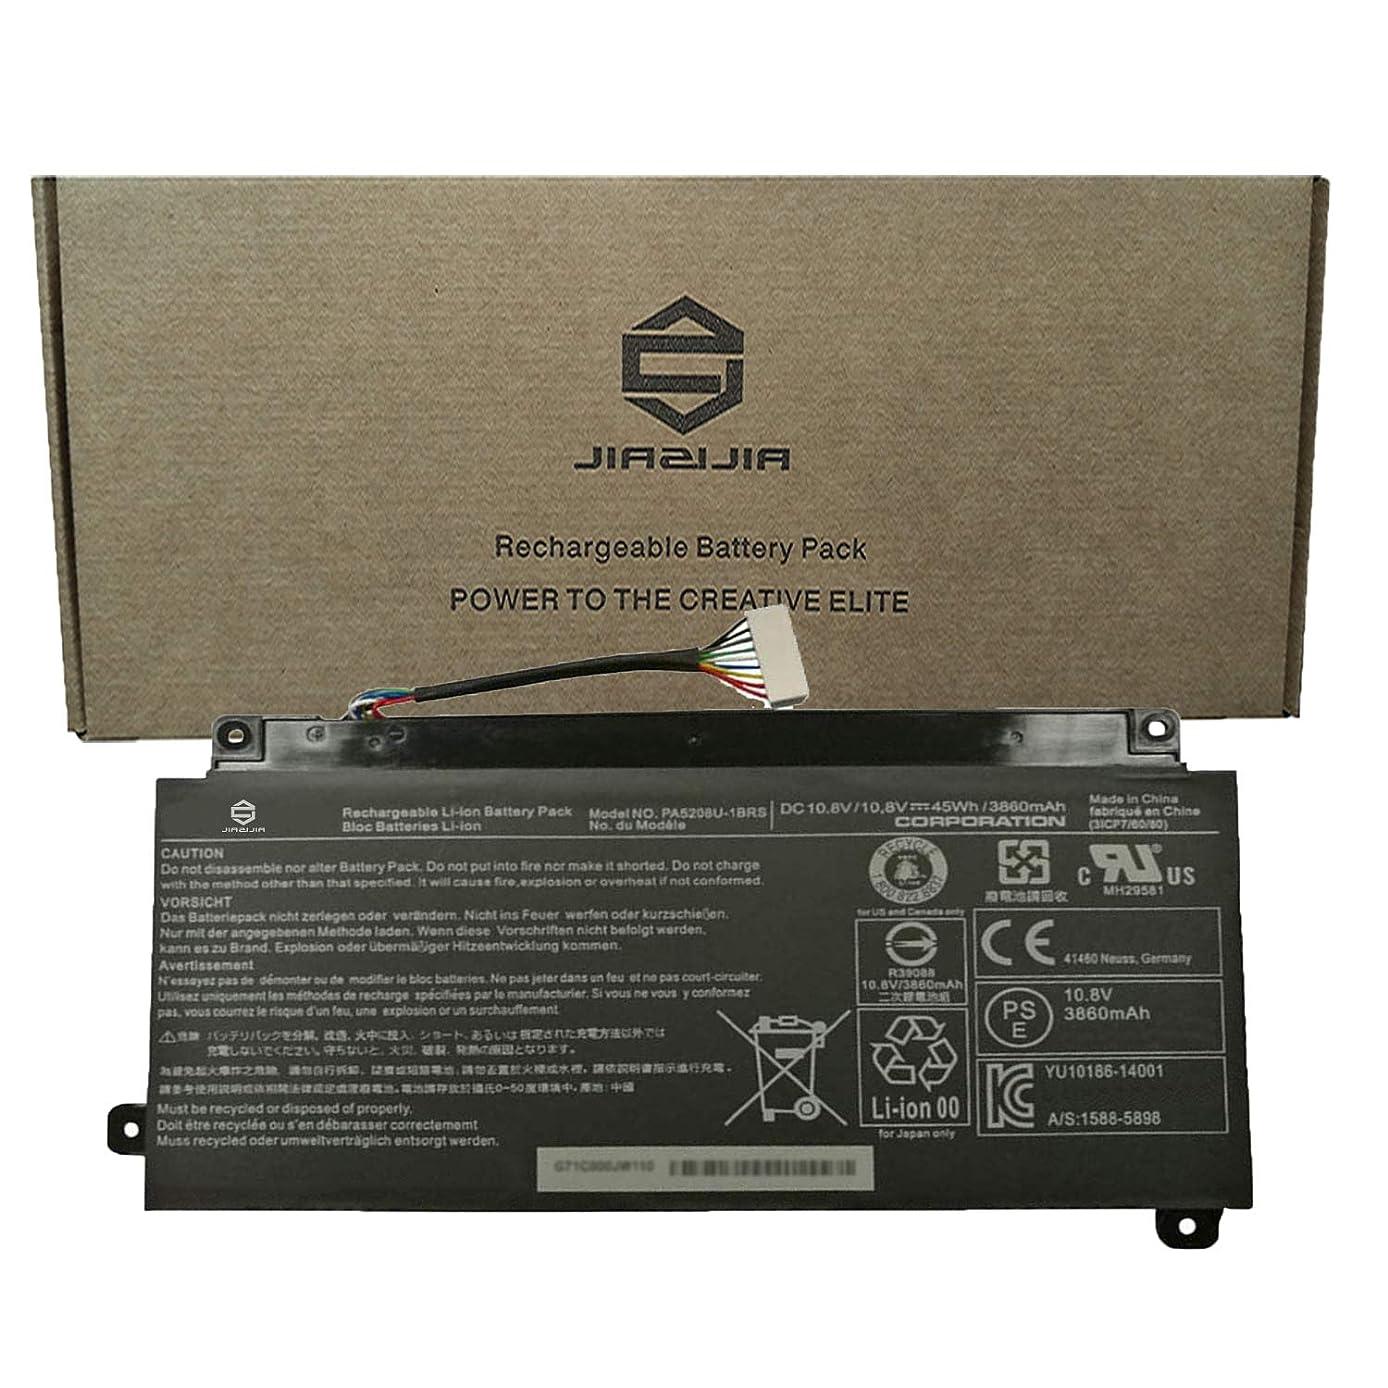 JIAZIJIA PA5208U-1BRS Laptop Battery Compatible with Toshiba Chromebook CB30 CB35 Satellite Radius 14 L40W E45W L55W P55W P50W Series Notebook P000619700 P000645710 PA5208U 10.8V 45Wh 3860mAh